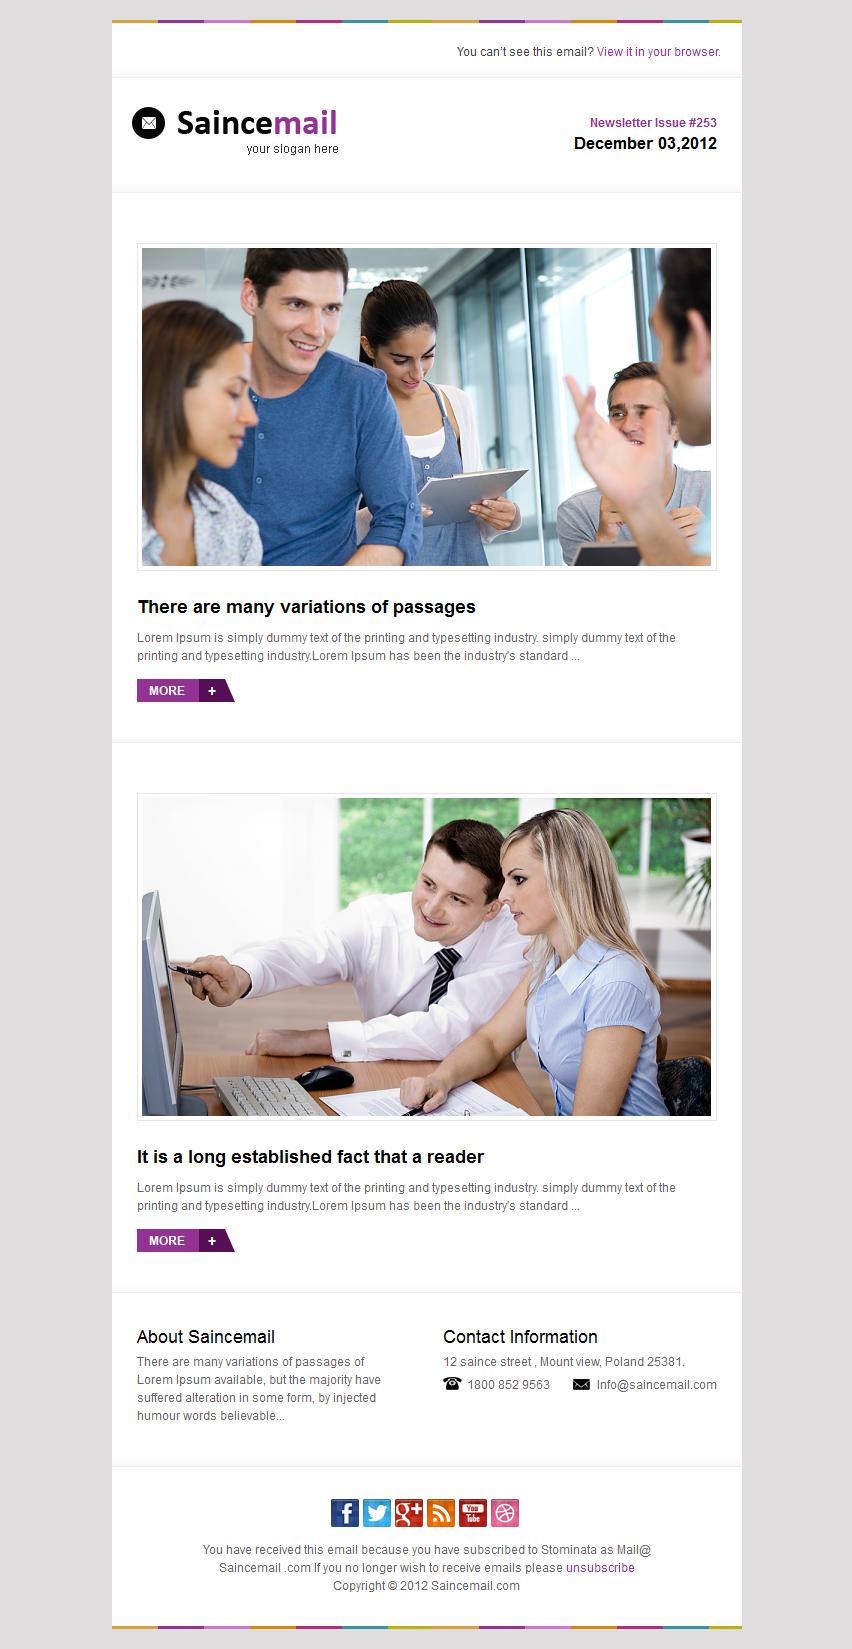 Saincemail E-mail Template